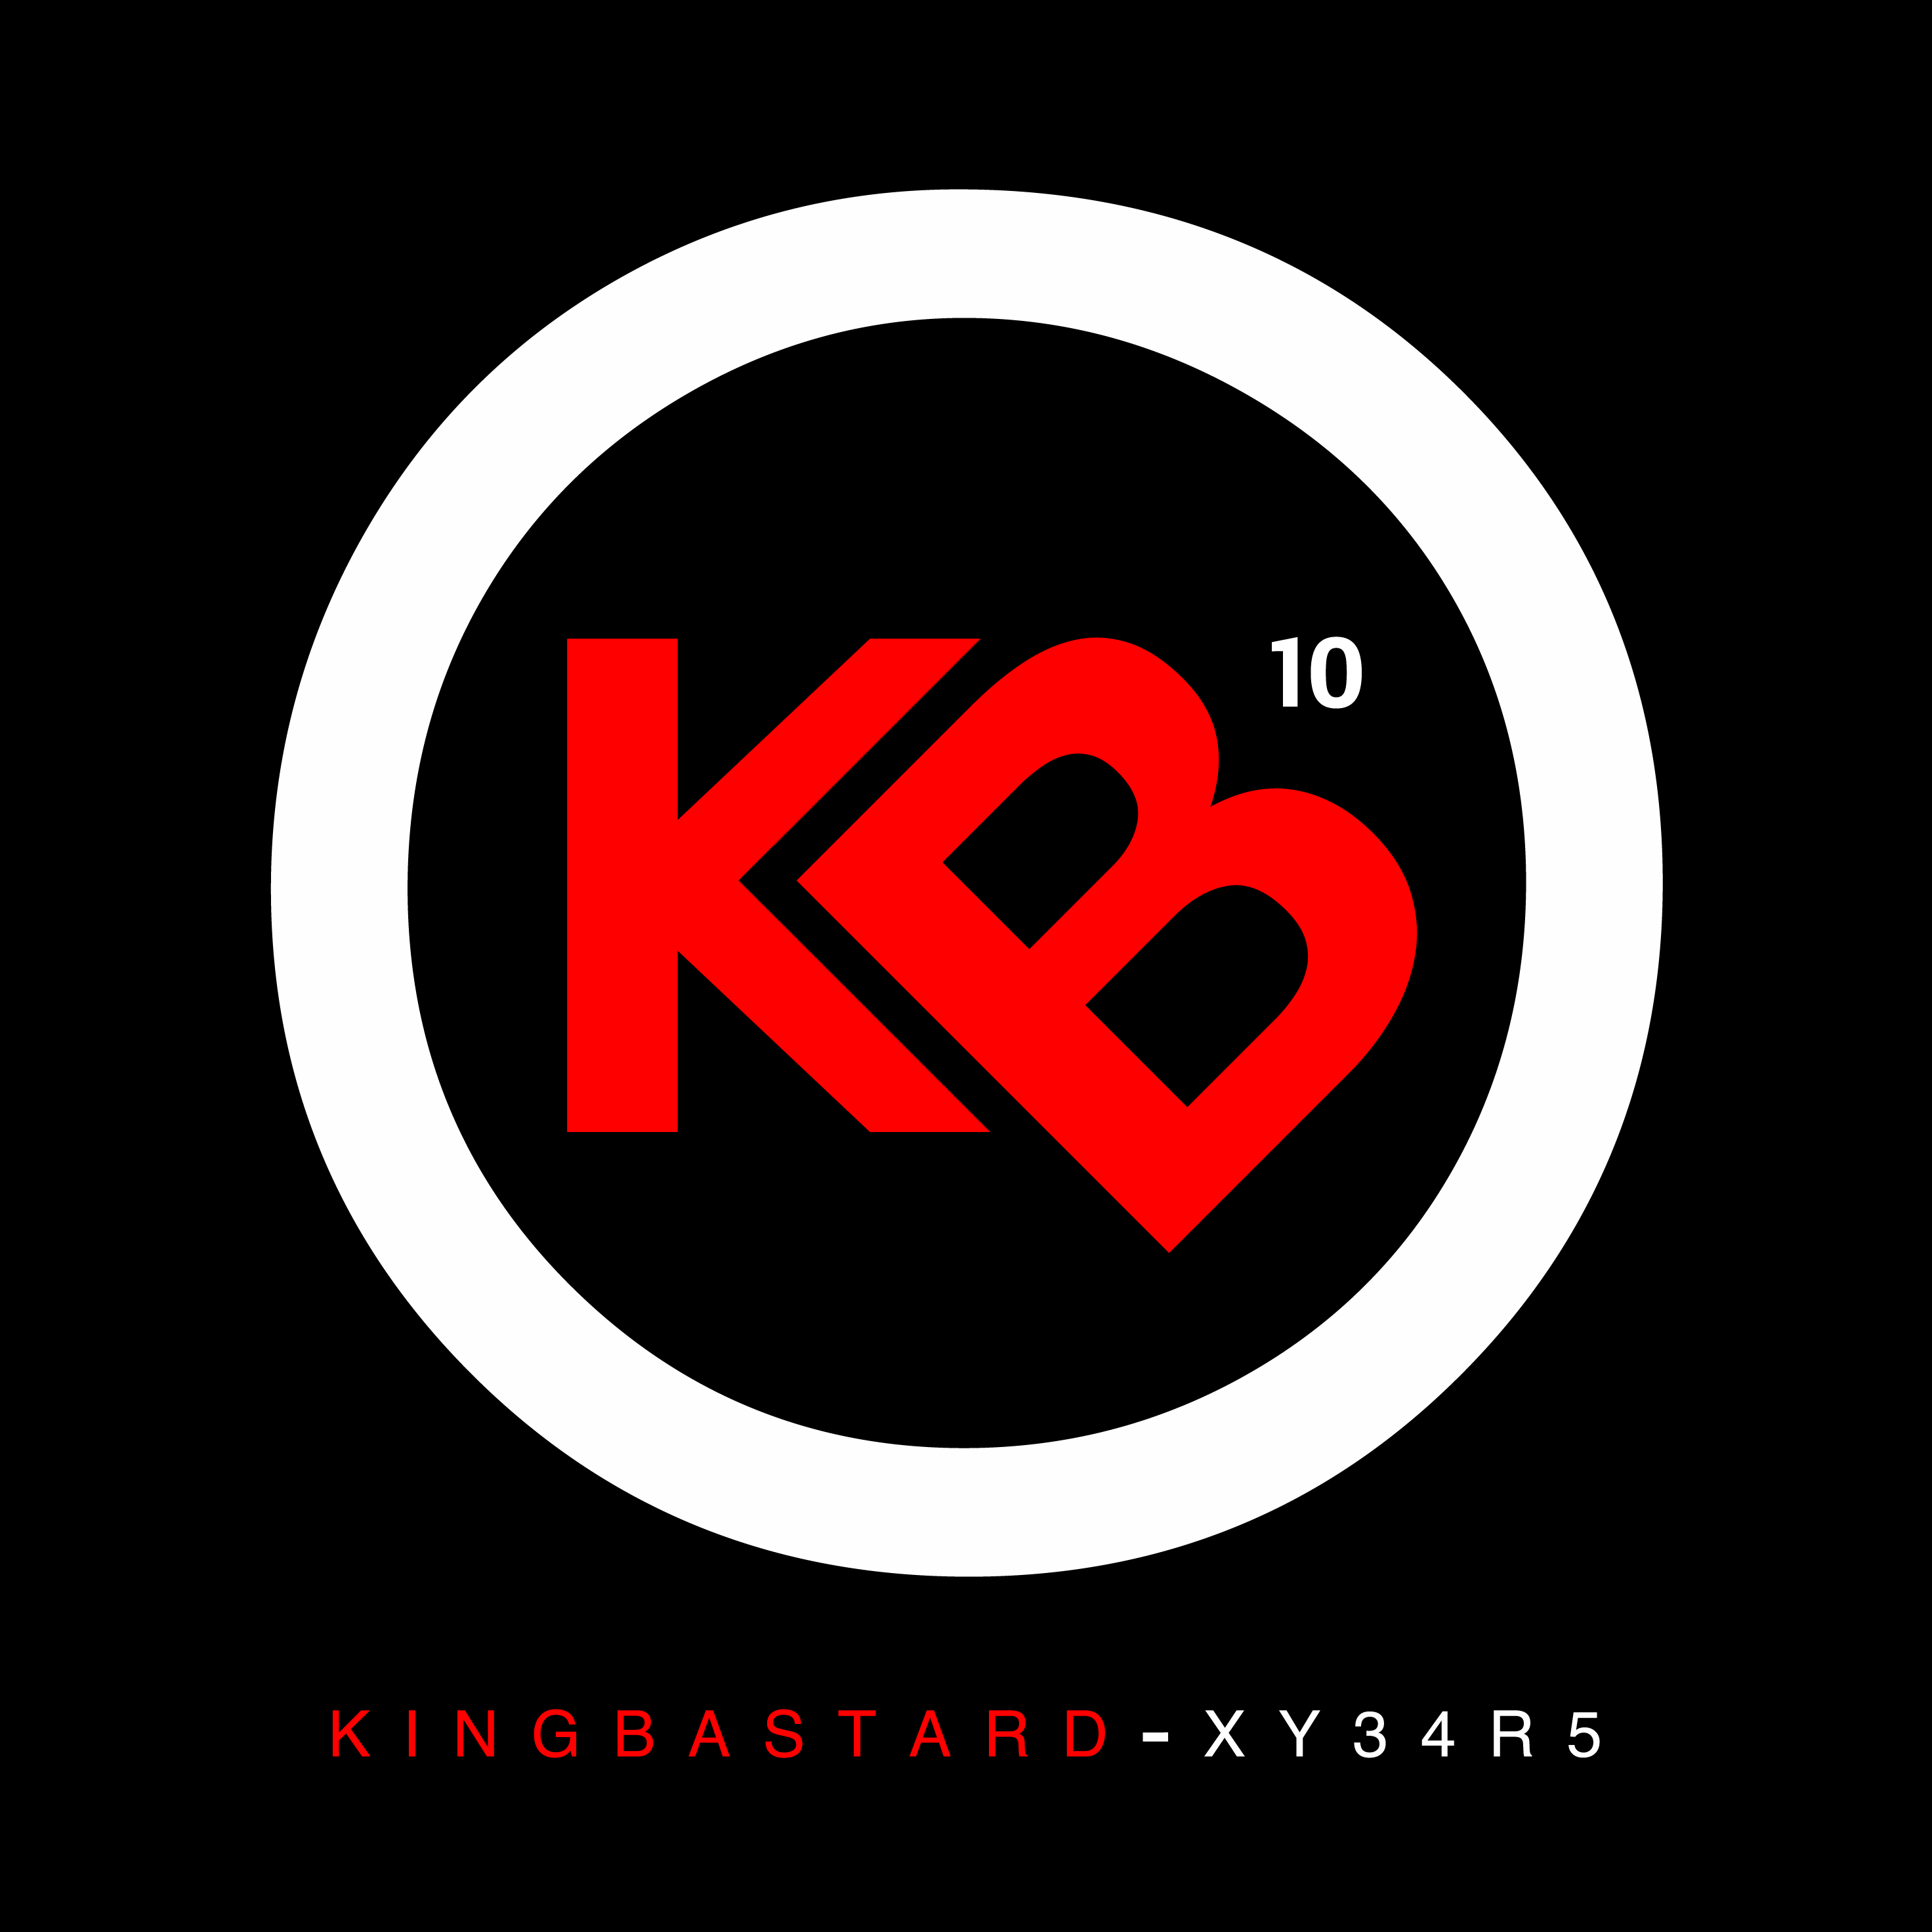 1030079_144378011562_KINGBASTARD-XY34R5-ADecadeofBastardism--cover.png